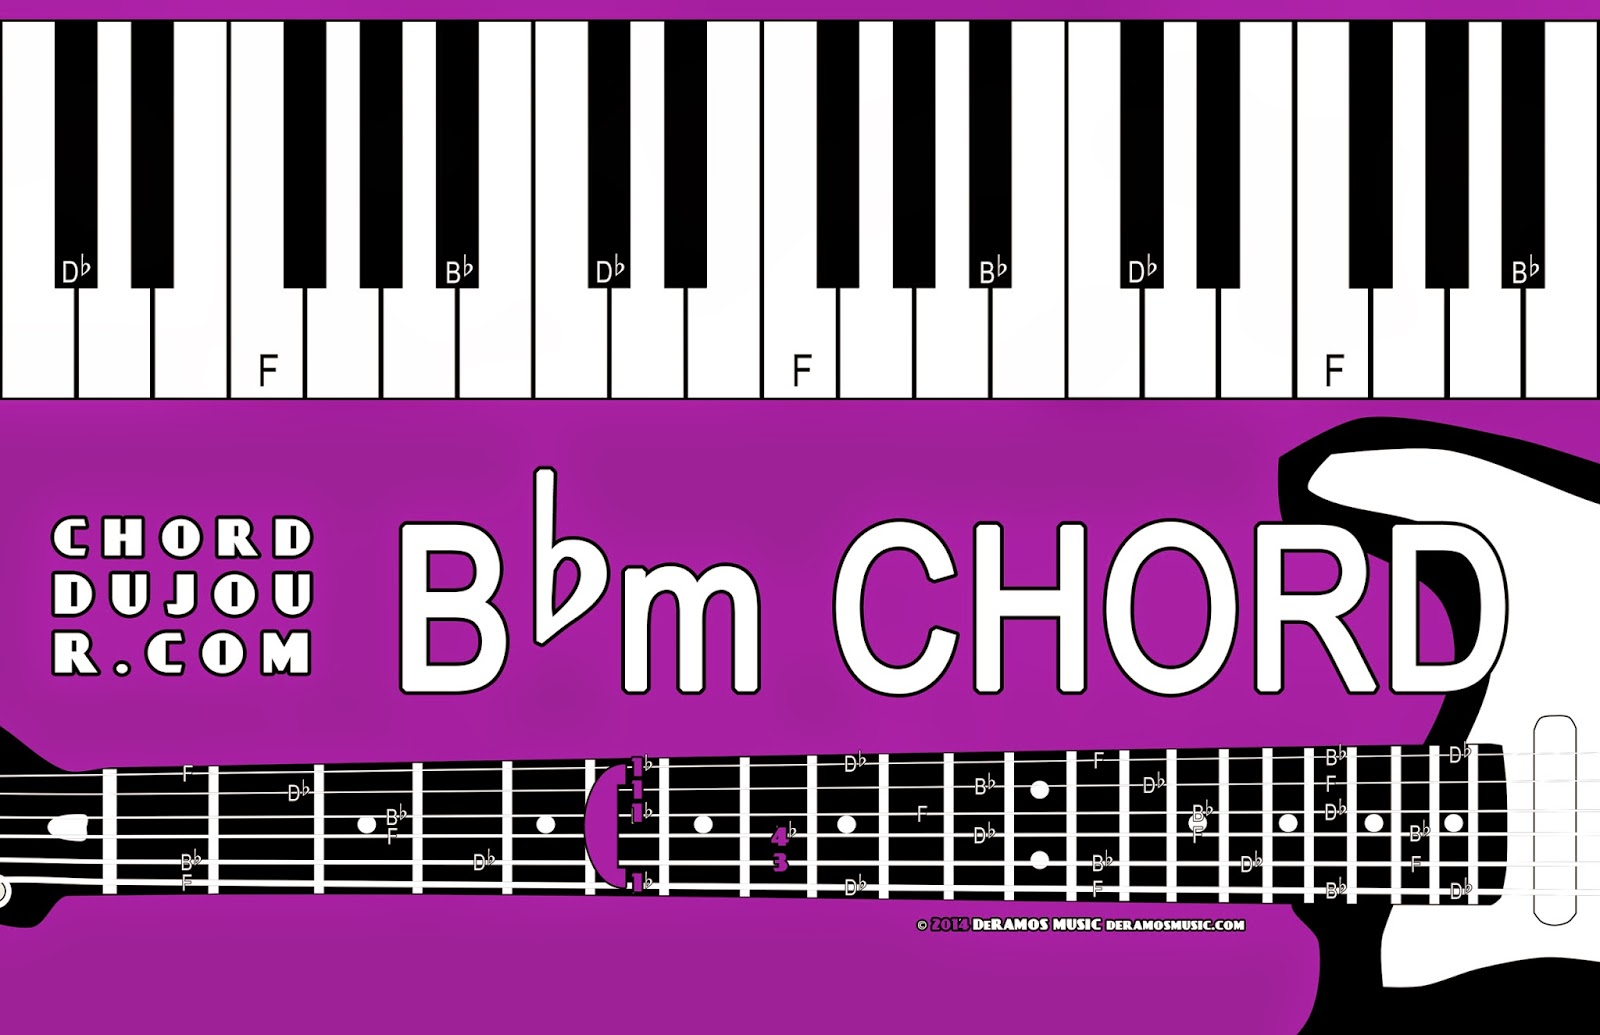 Chord Du Jour Chord Deux Jour Challenge Bbm And Db